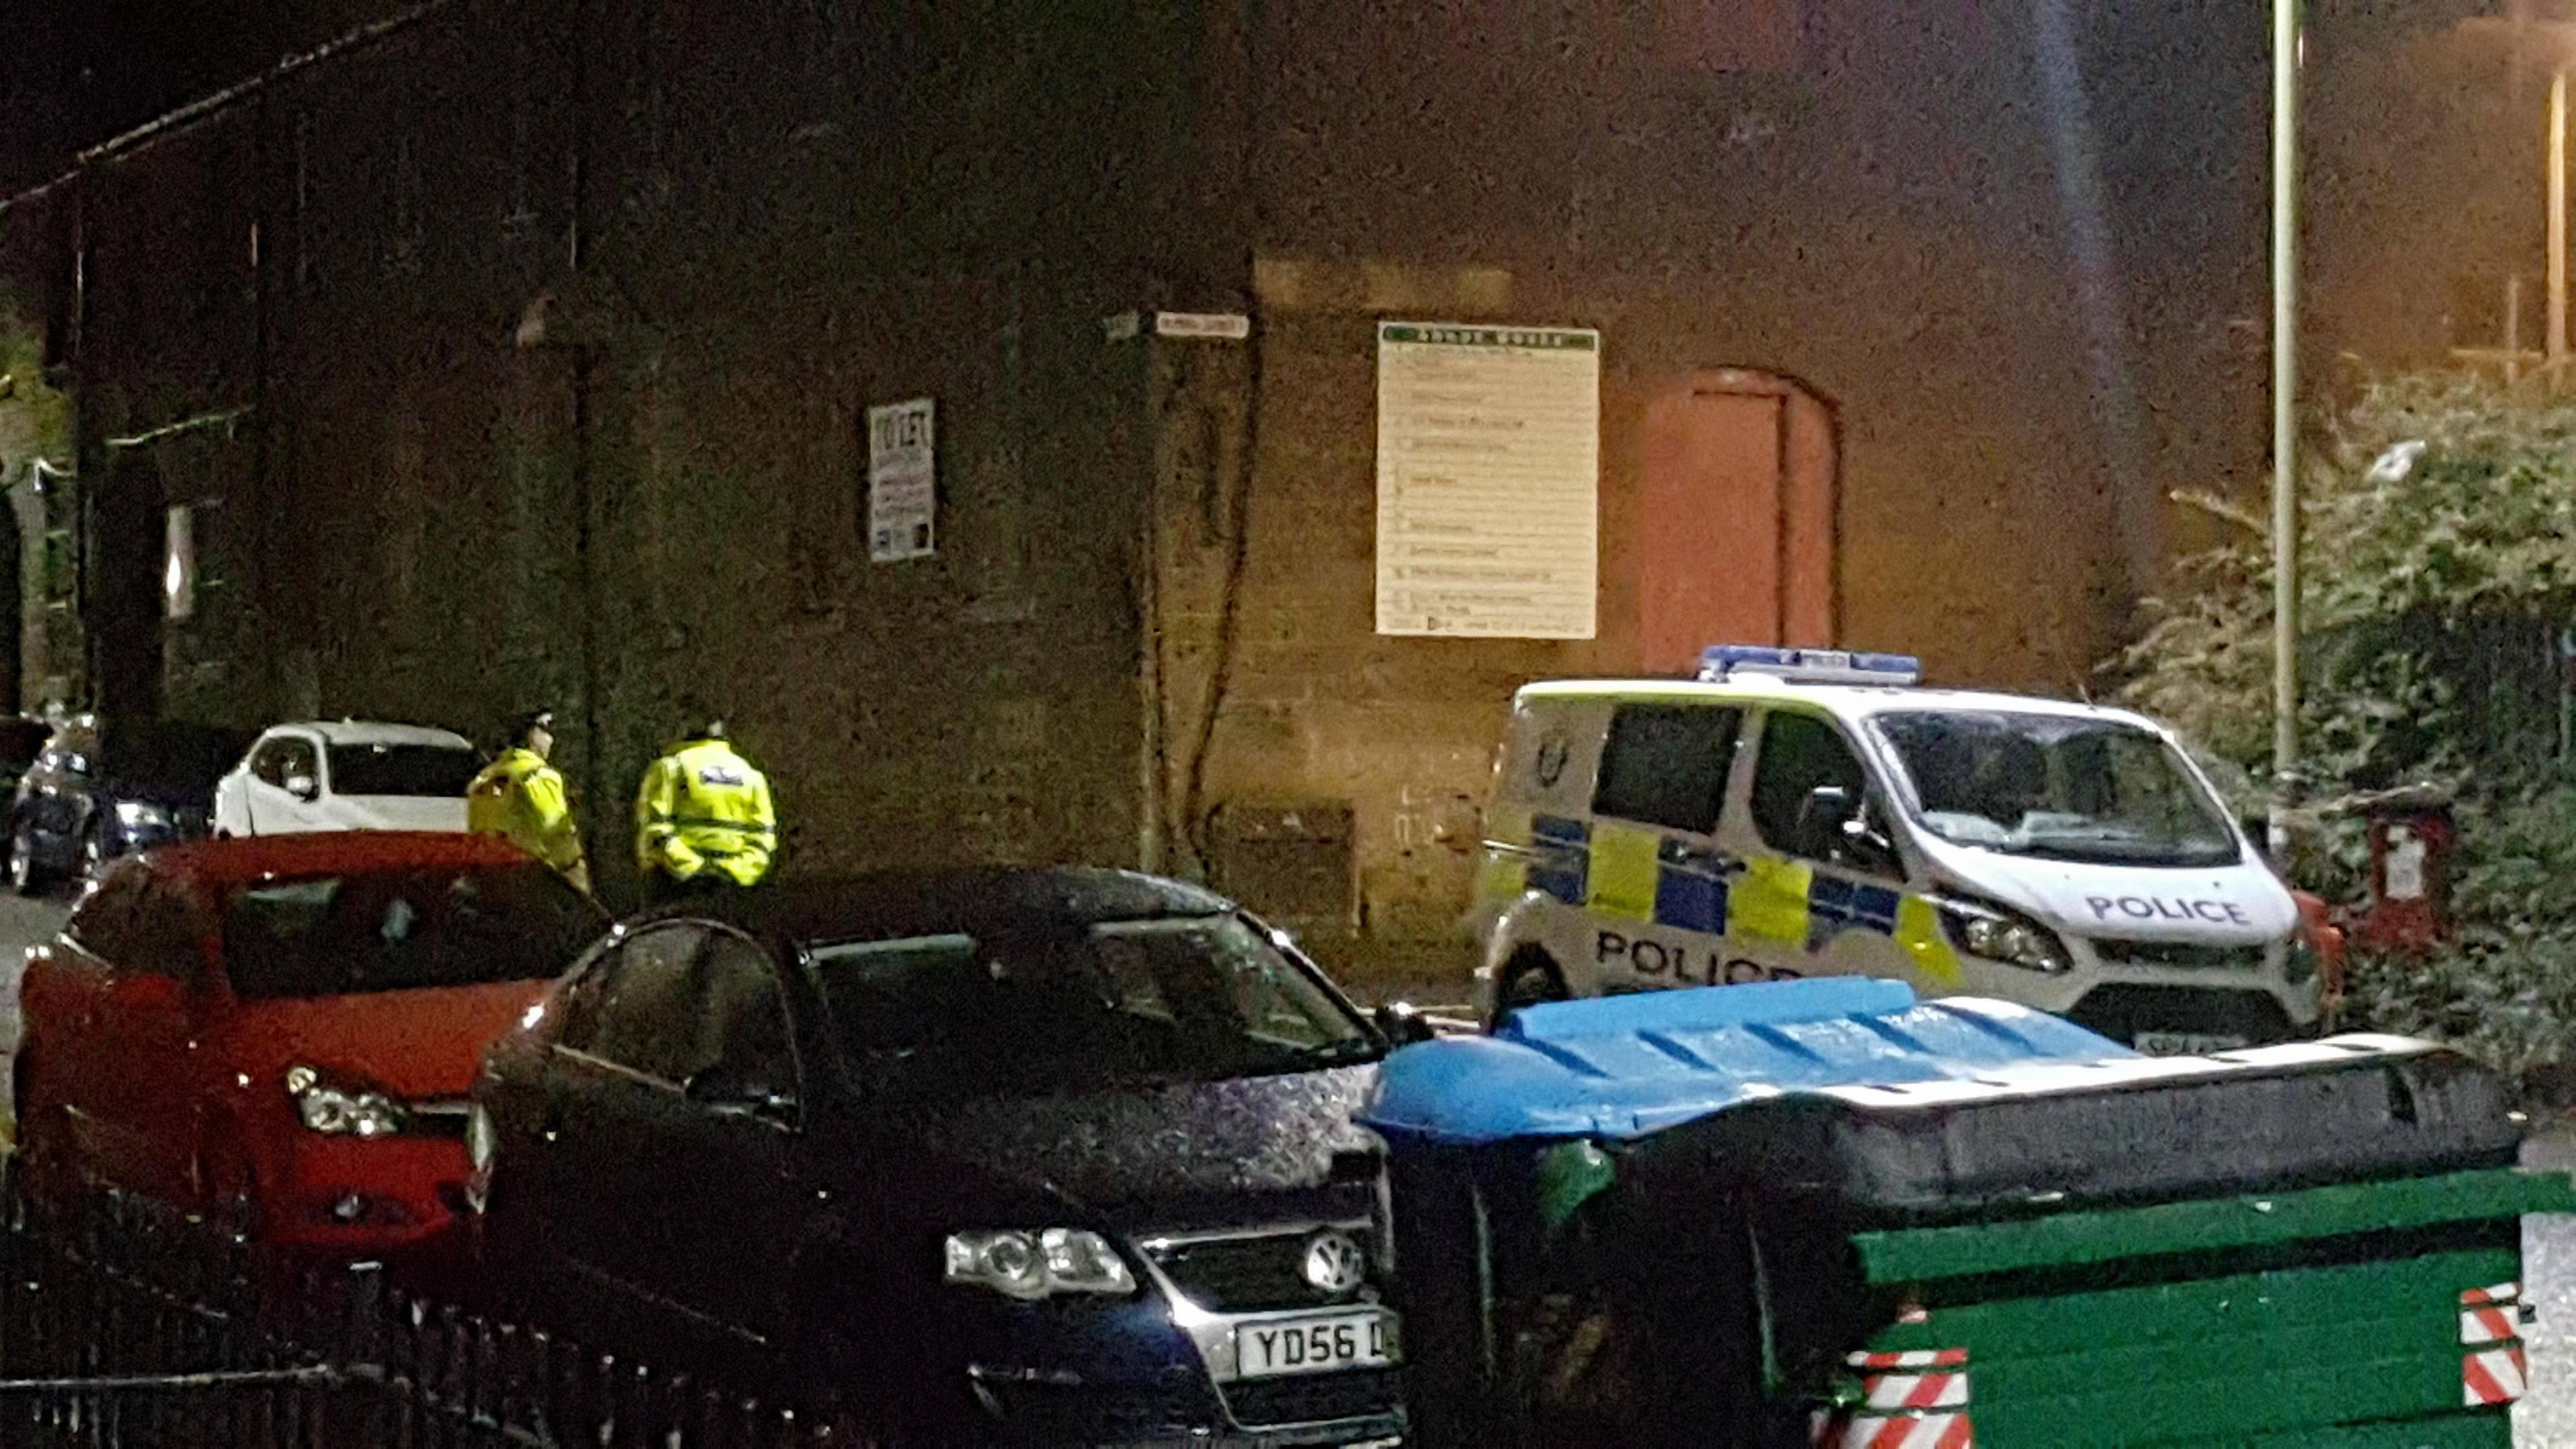 Police stand guard near the scene